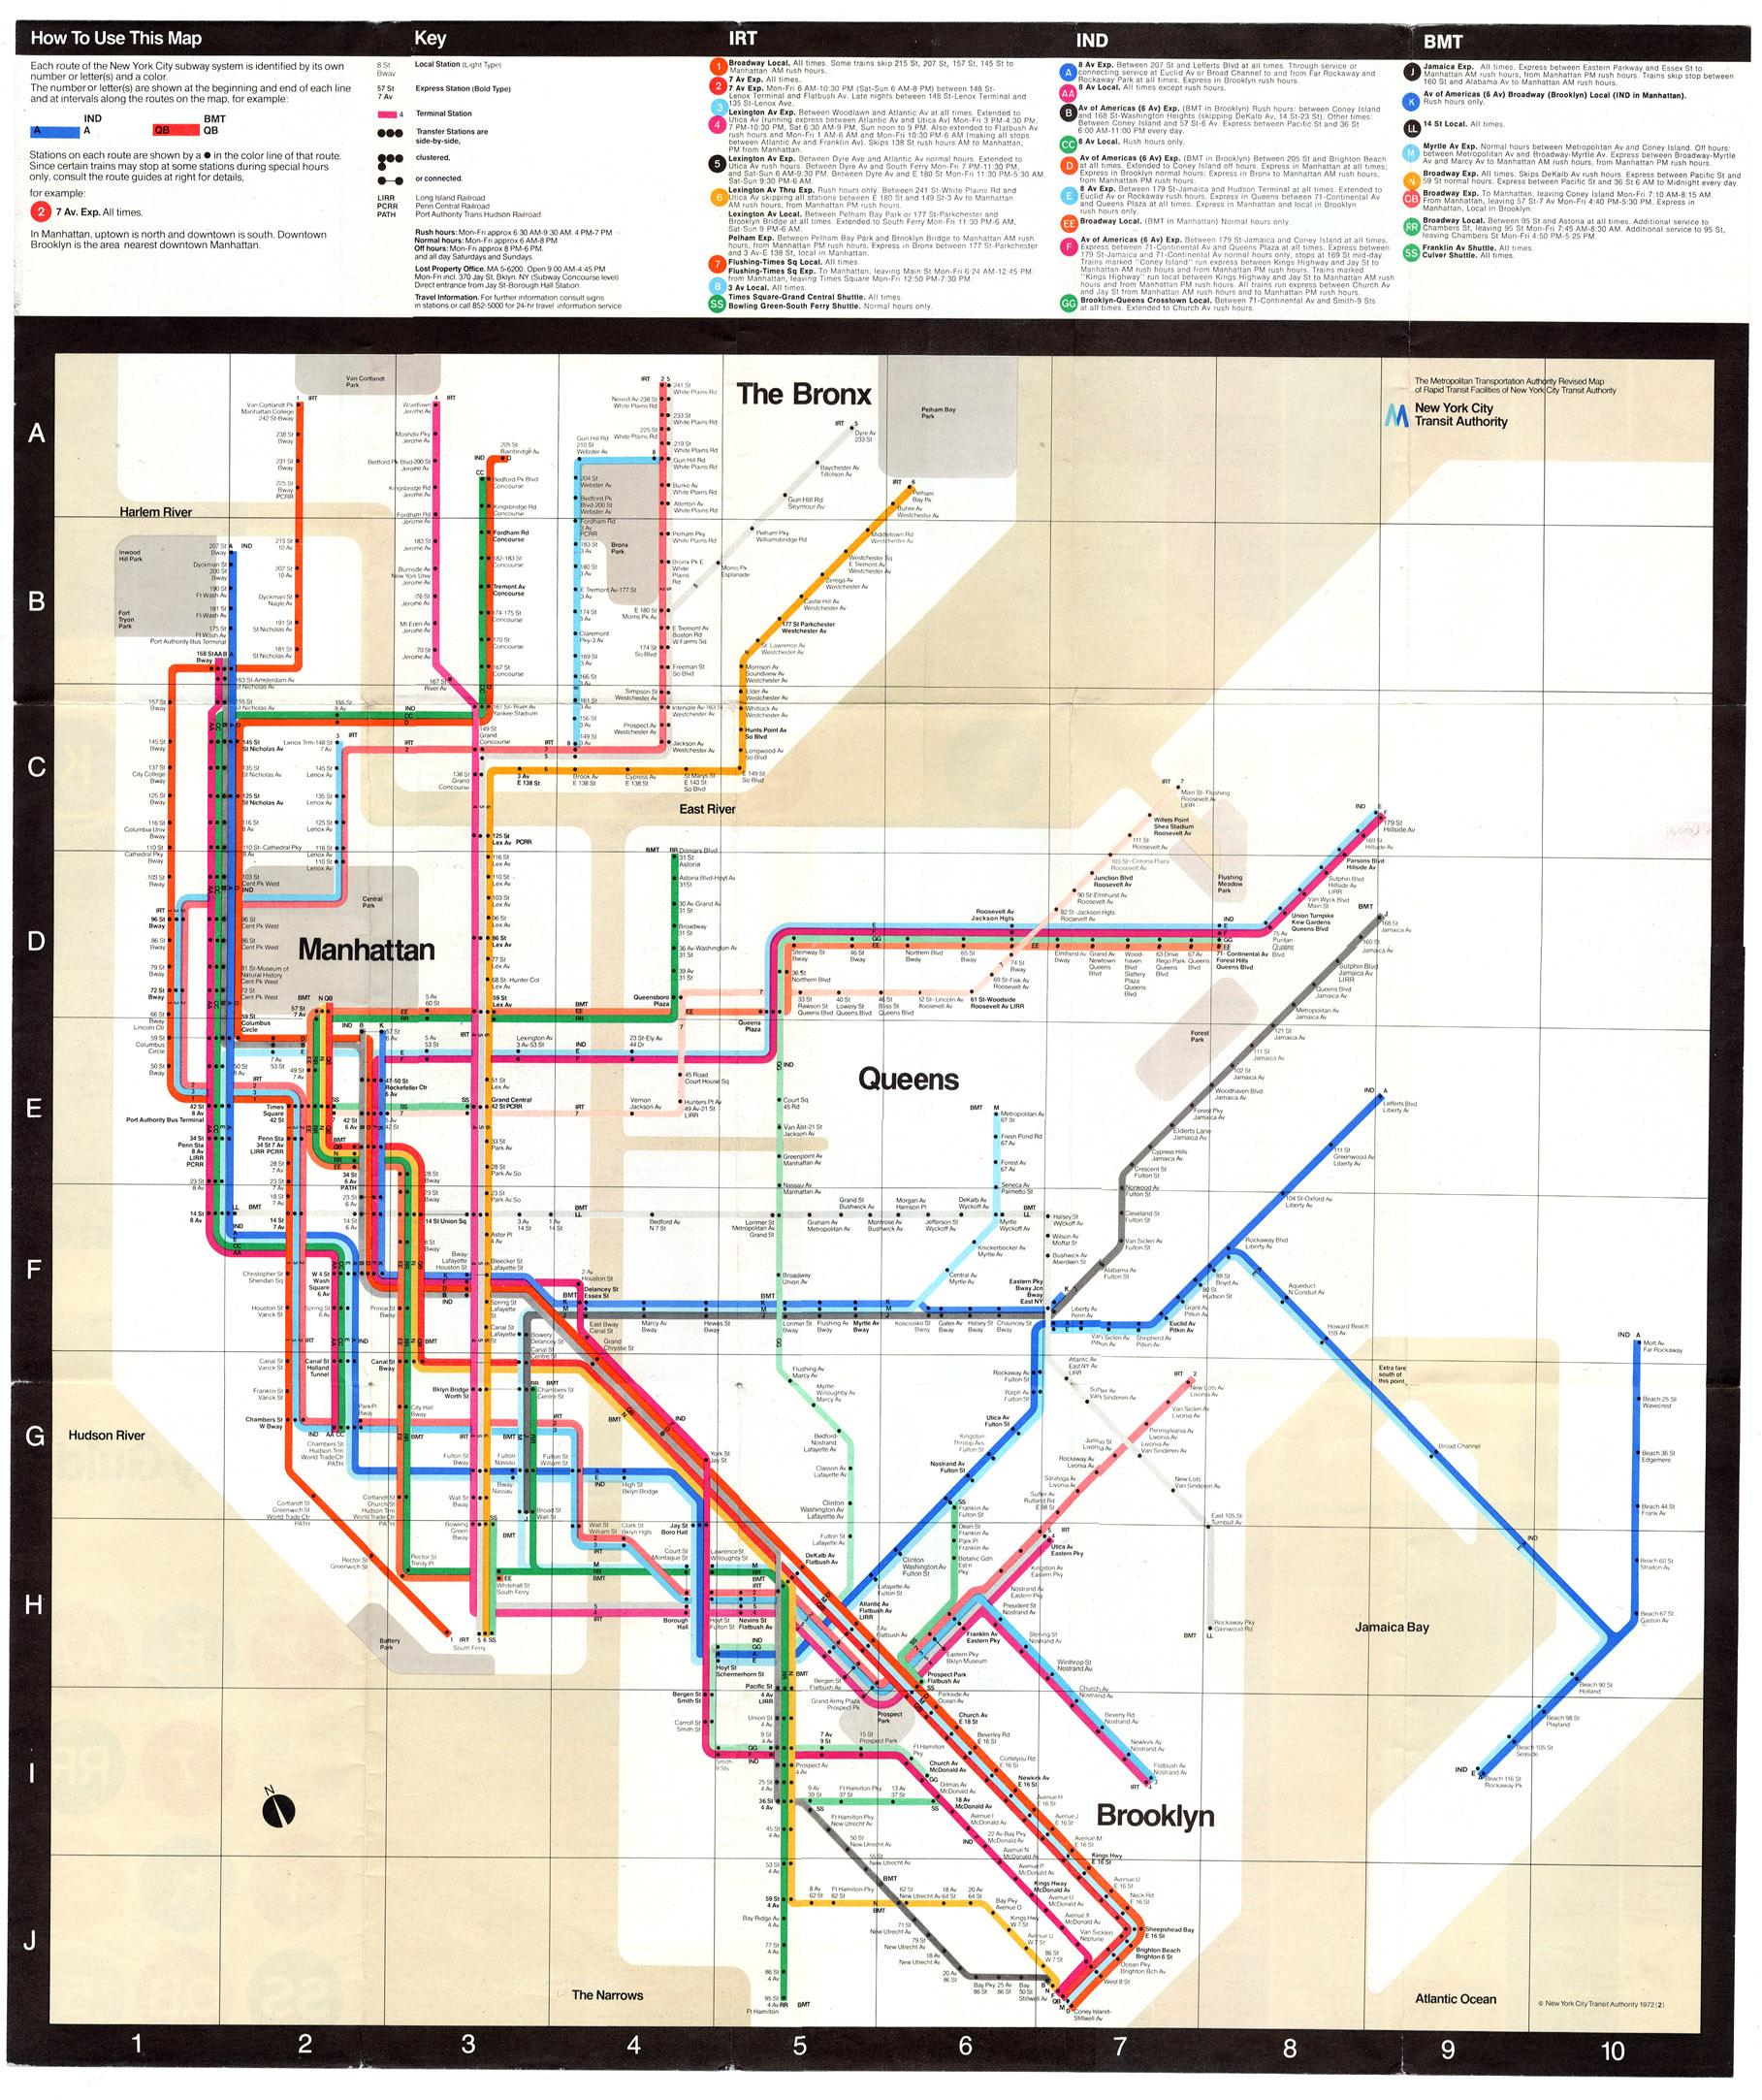 Massimo Vignelli Subway Map Poster